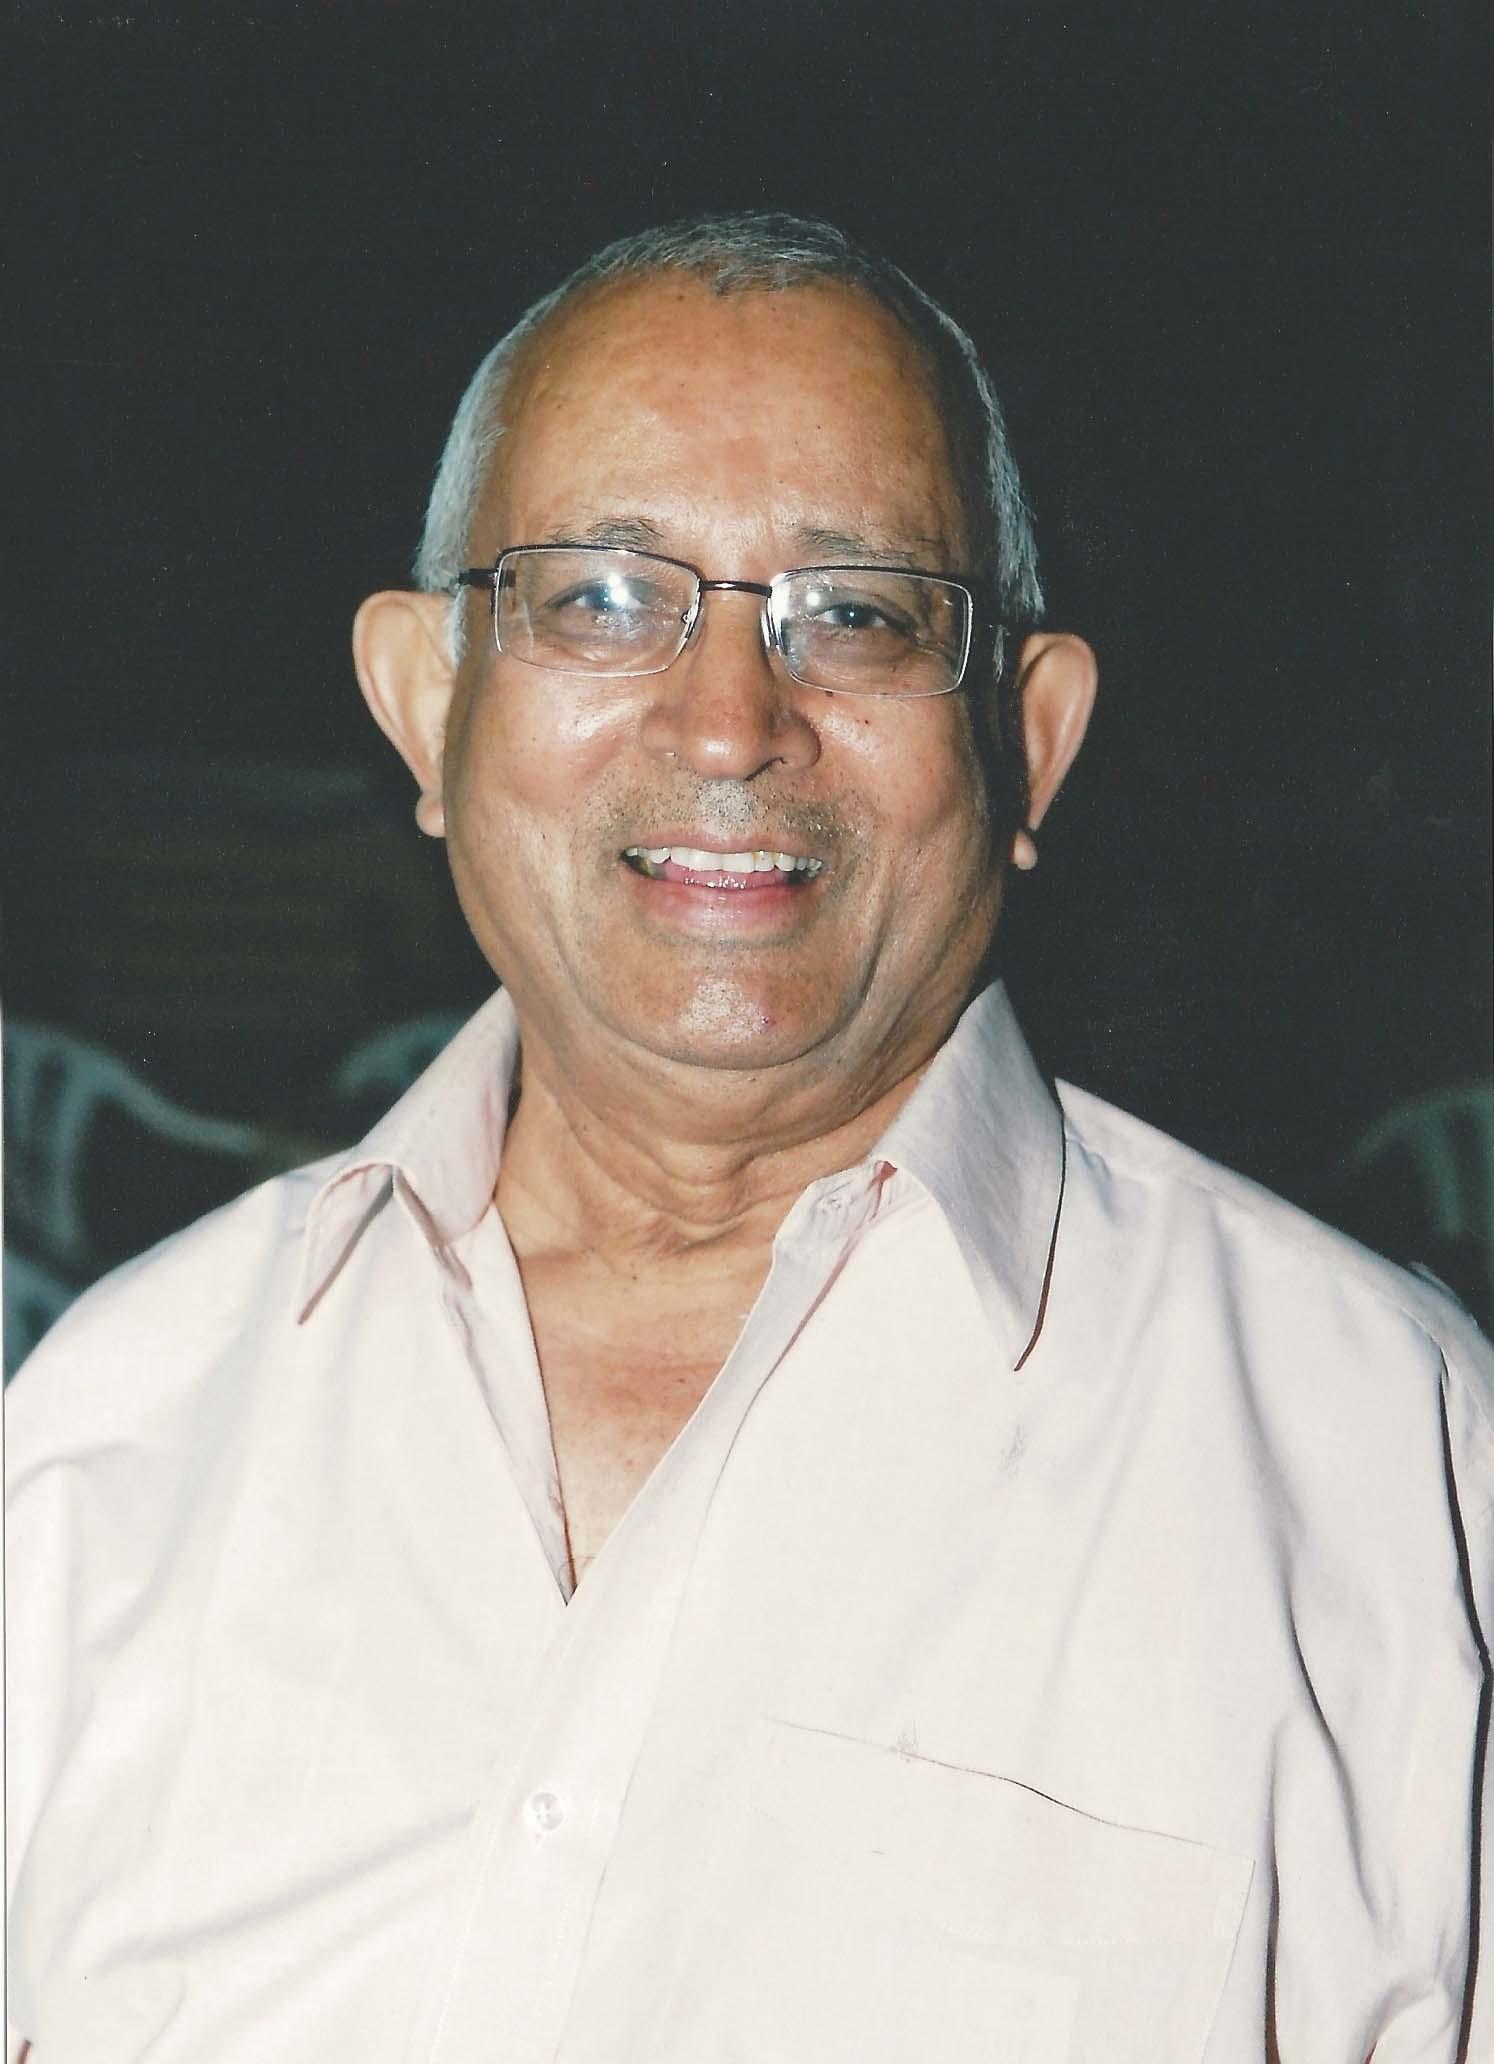 Mafat Patel